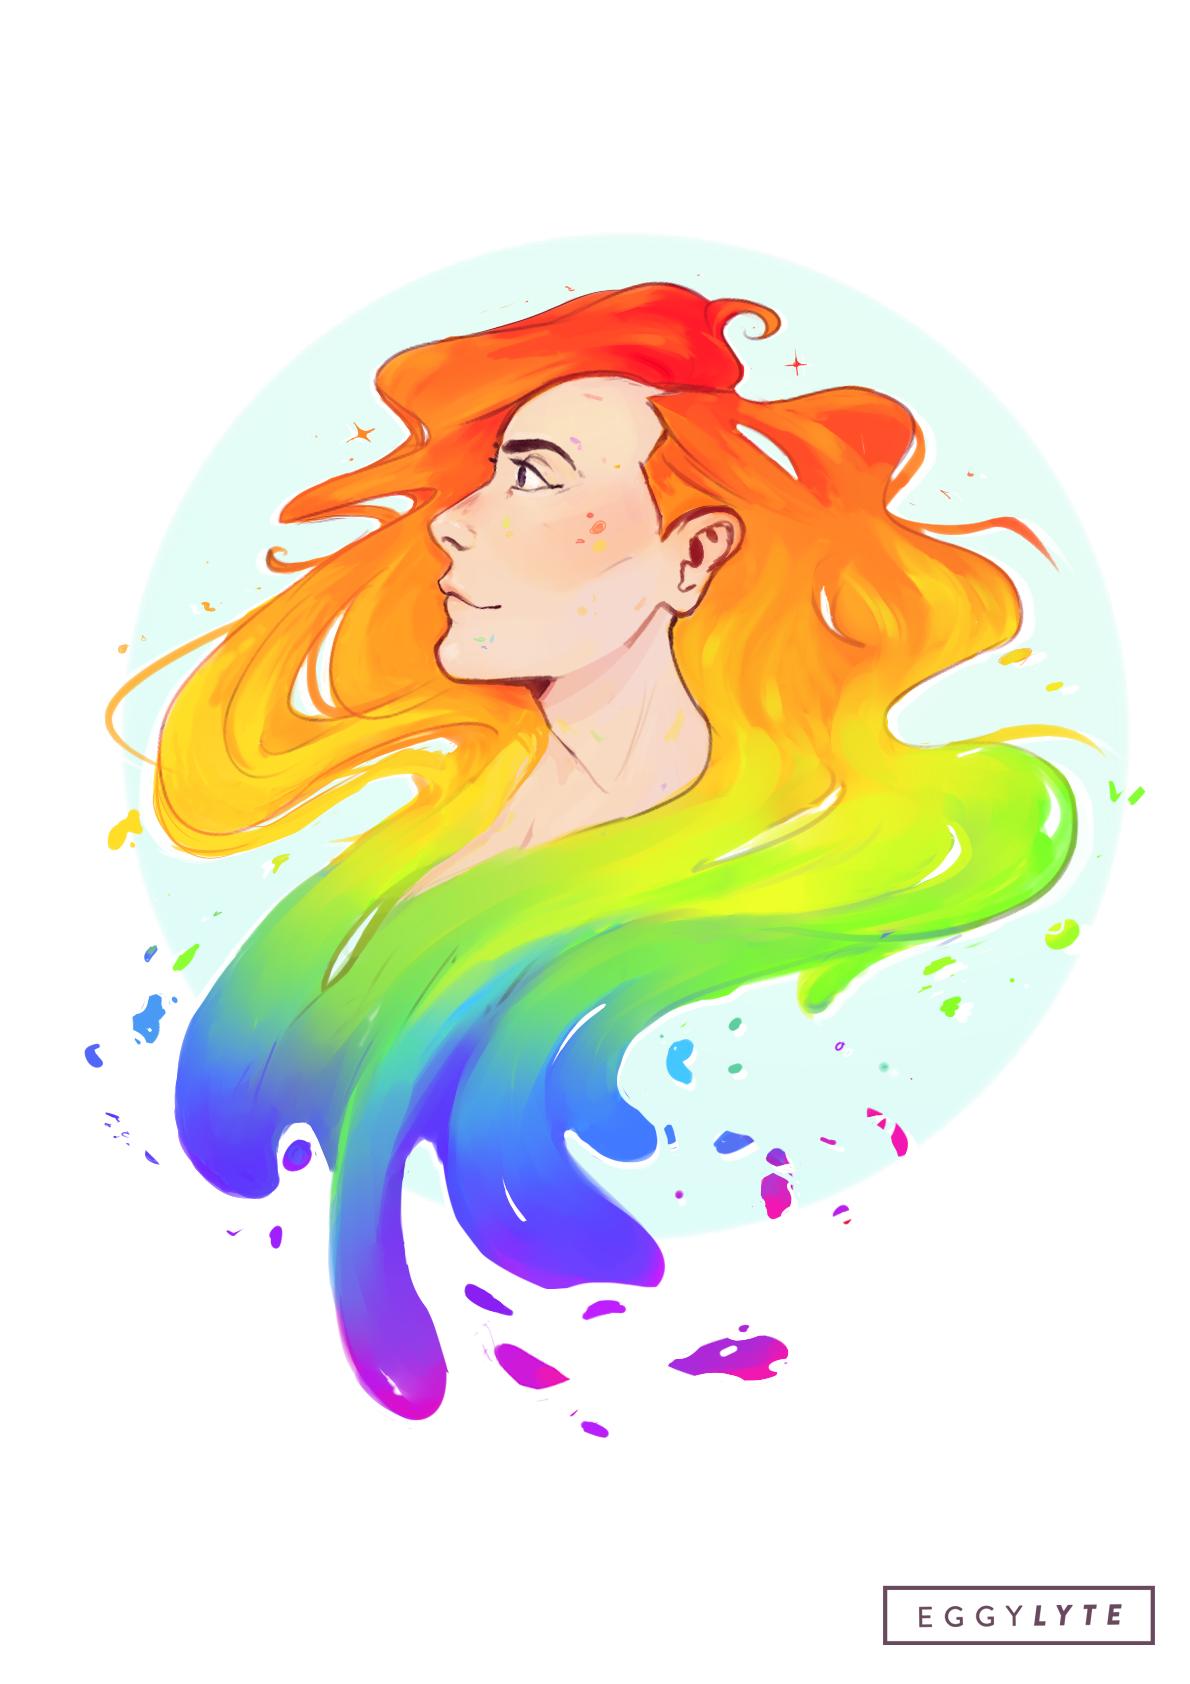 Splash, a drawing by Eggylyte